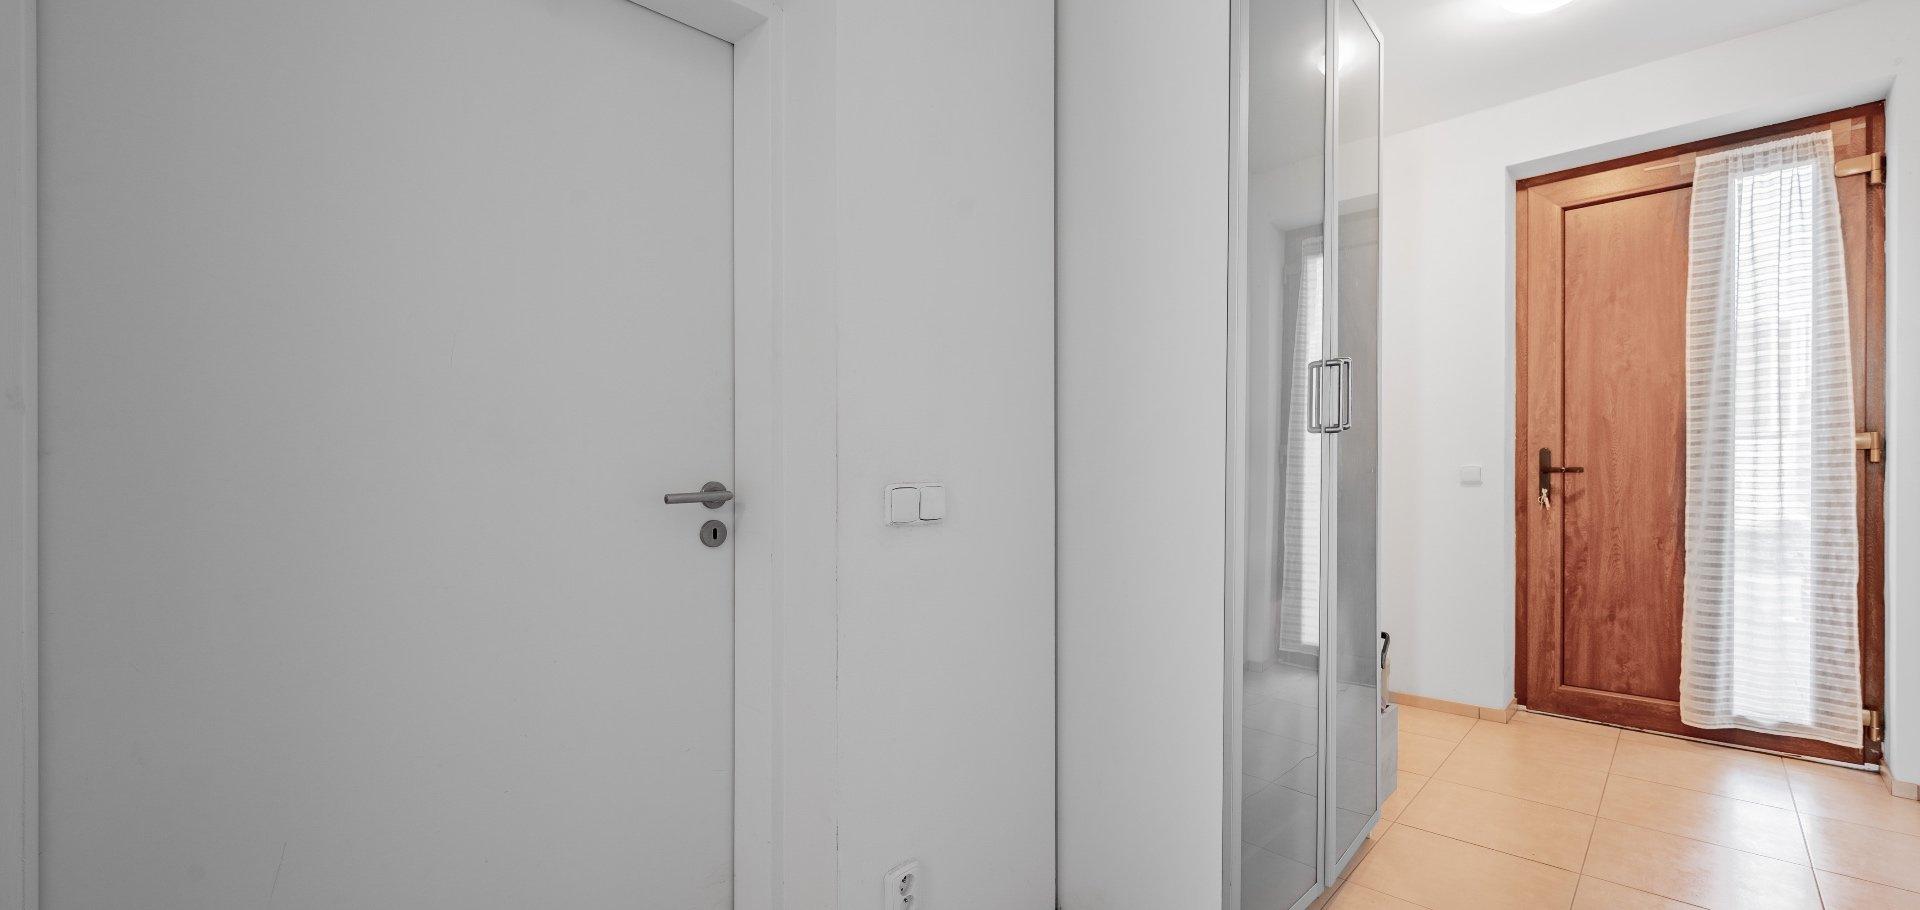 Pronájem, Byt 2+kk, 63m² (+59m² terasa) - Kutná Hora - Karlov